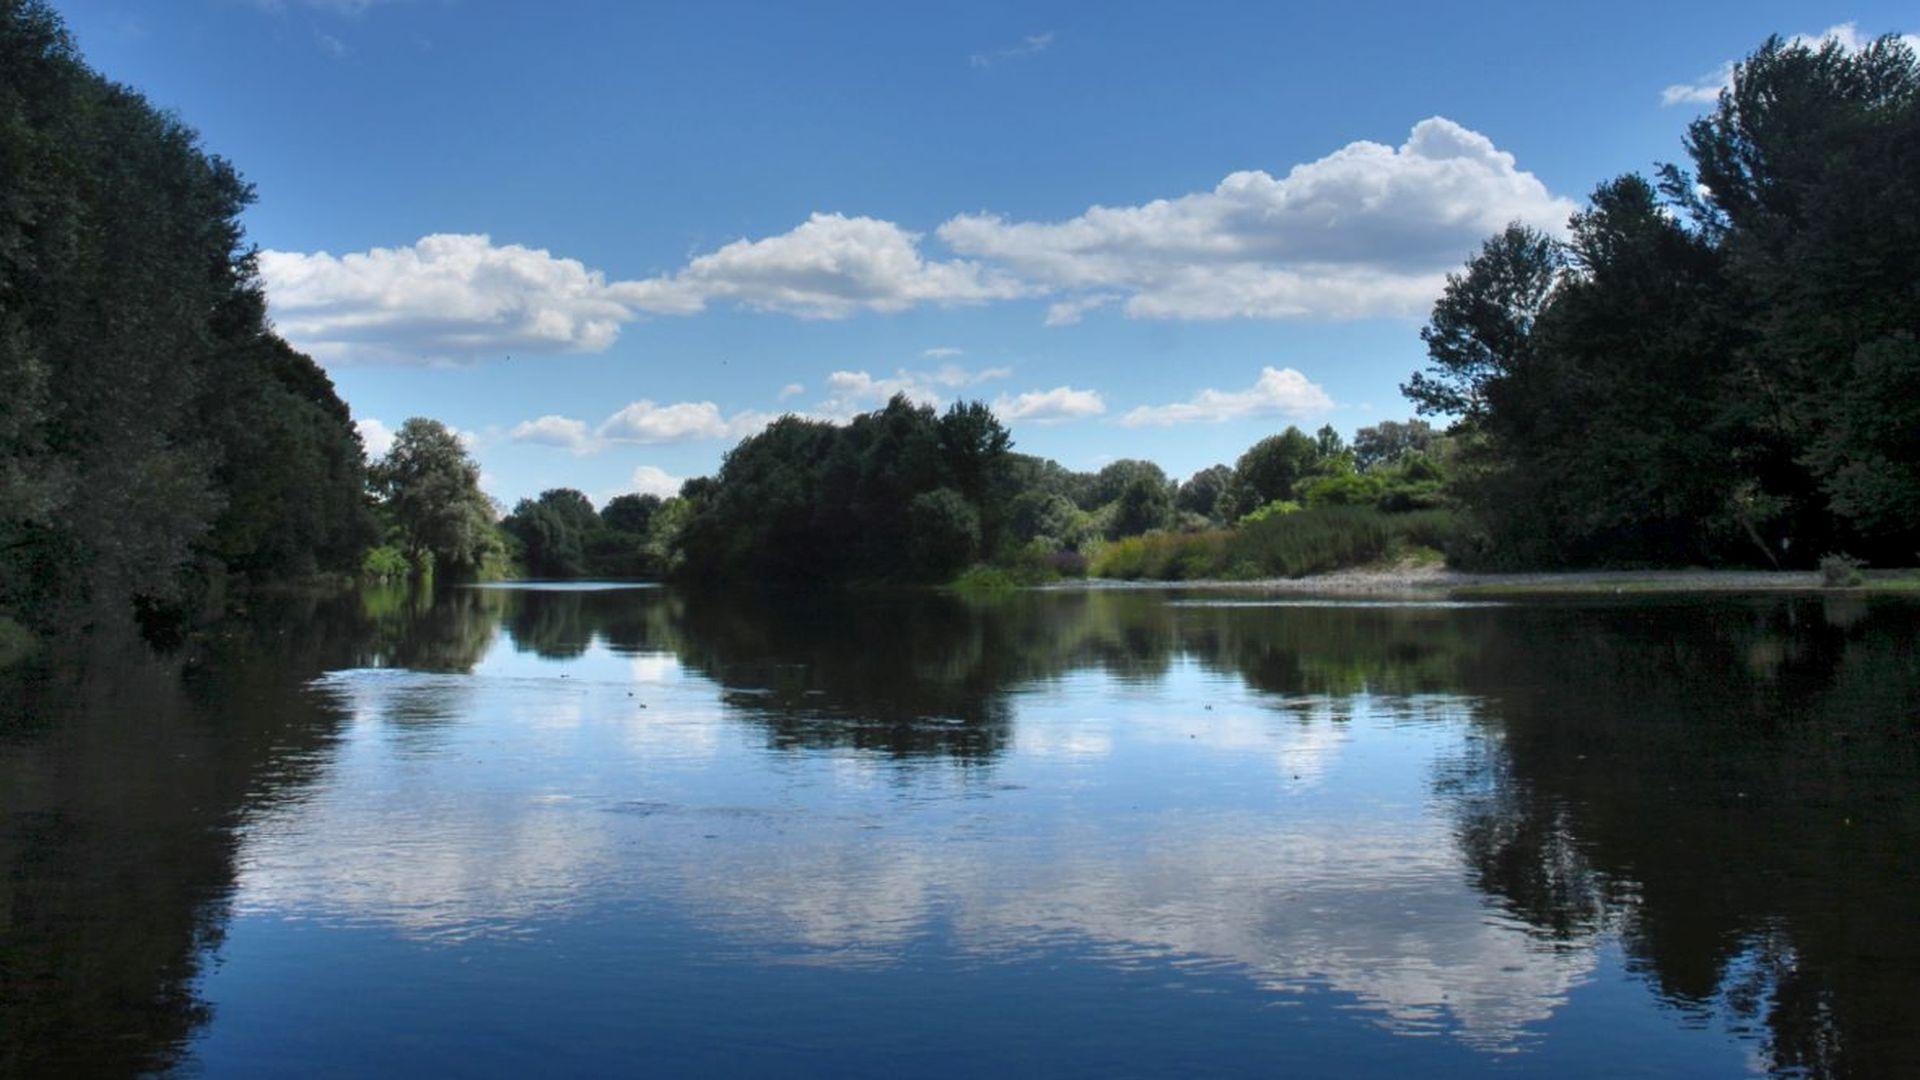 fiume serchio a monte san quirico